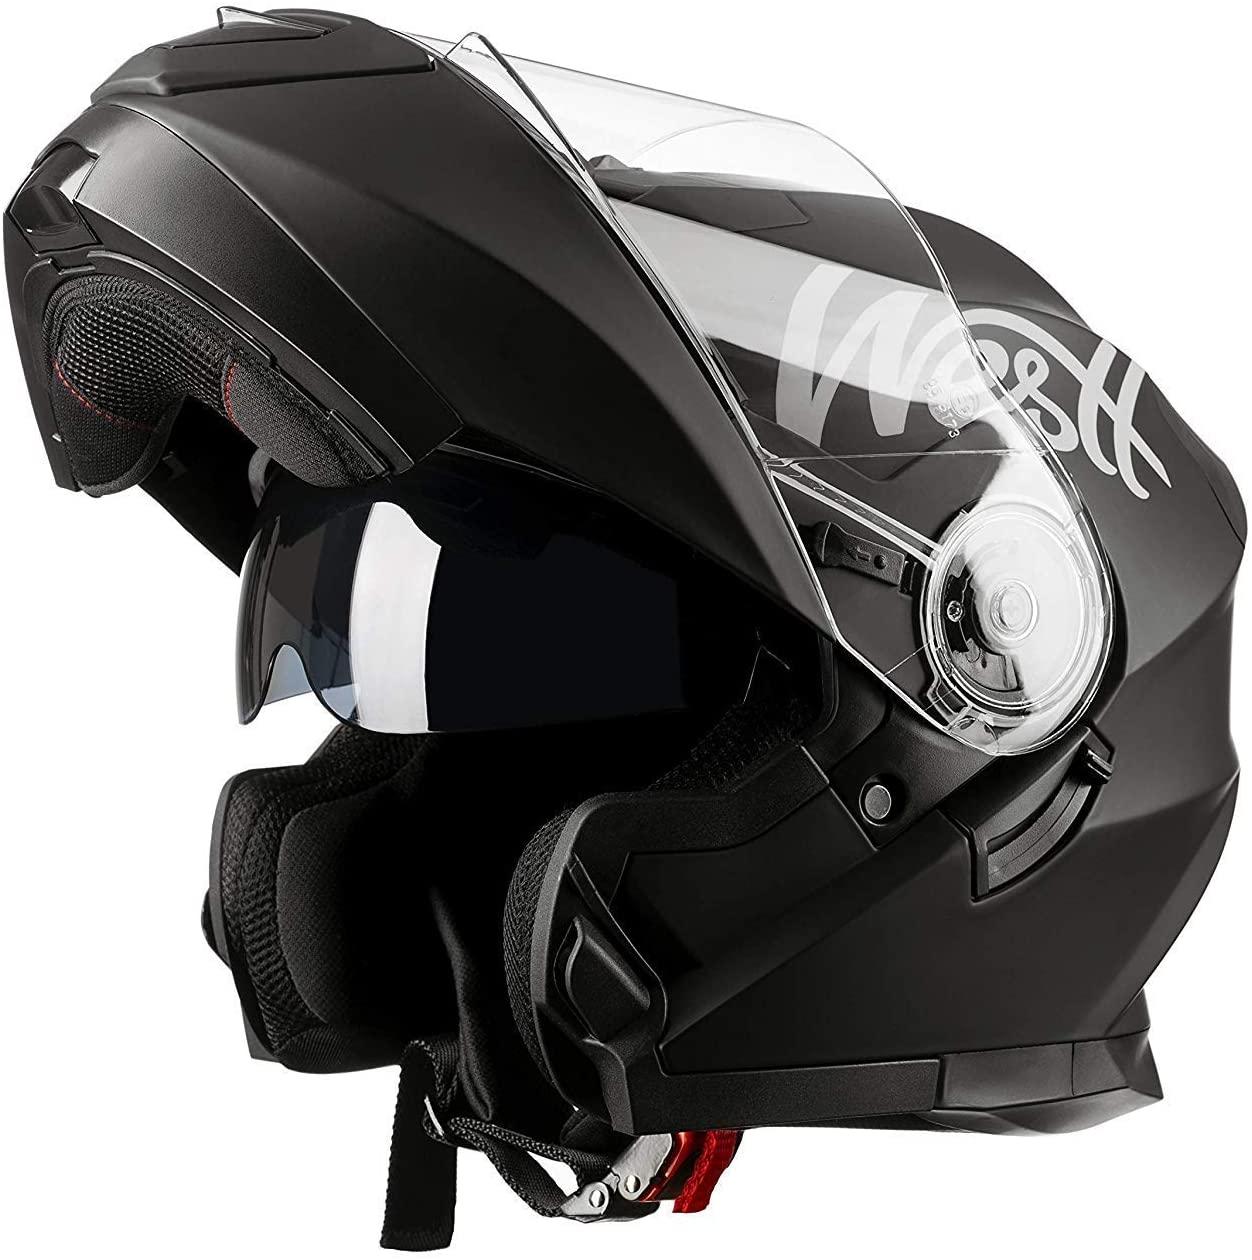 Westt Torque X · Casco Modulare Moto Nero Opaco Doppia Visiera Scooter Motorino